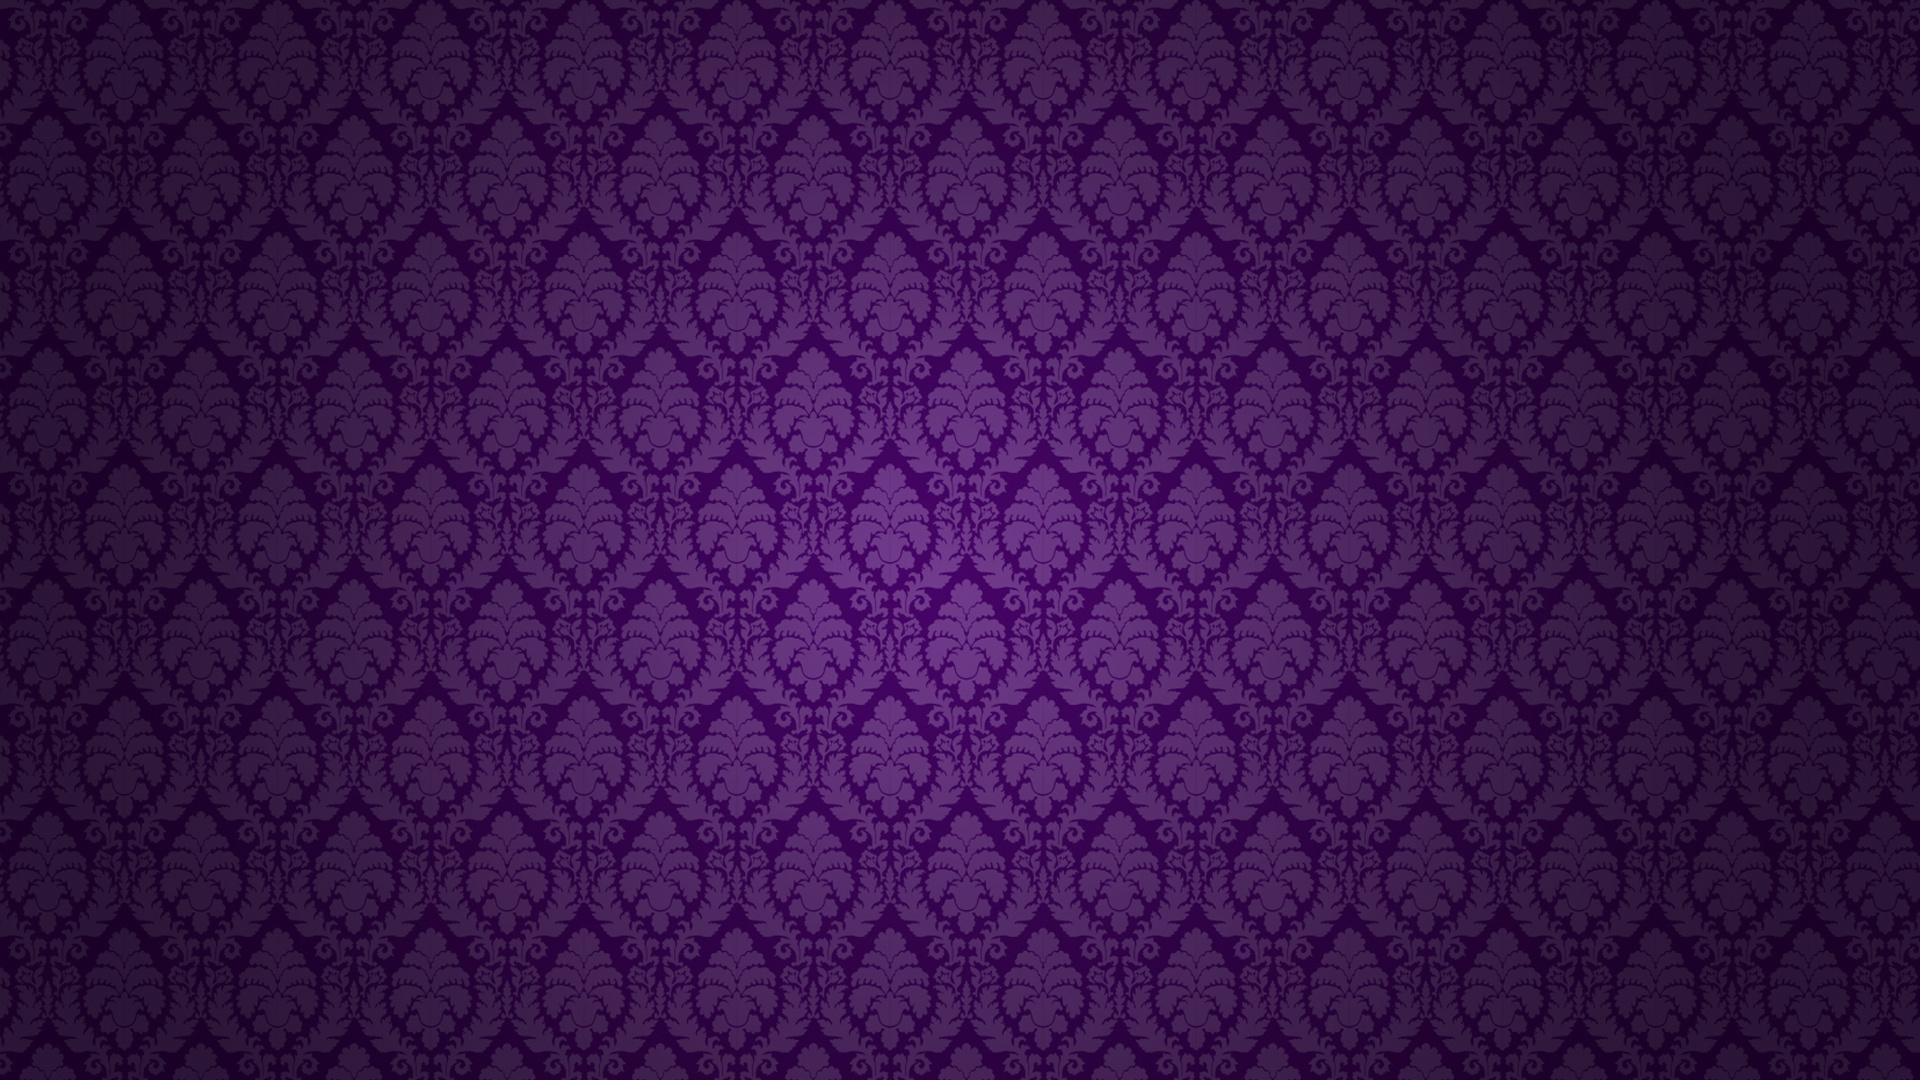 Purple wallpaper 3 1920x1080